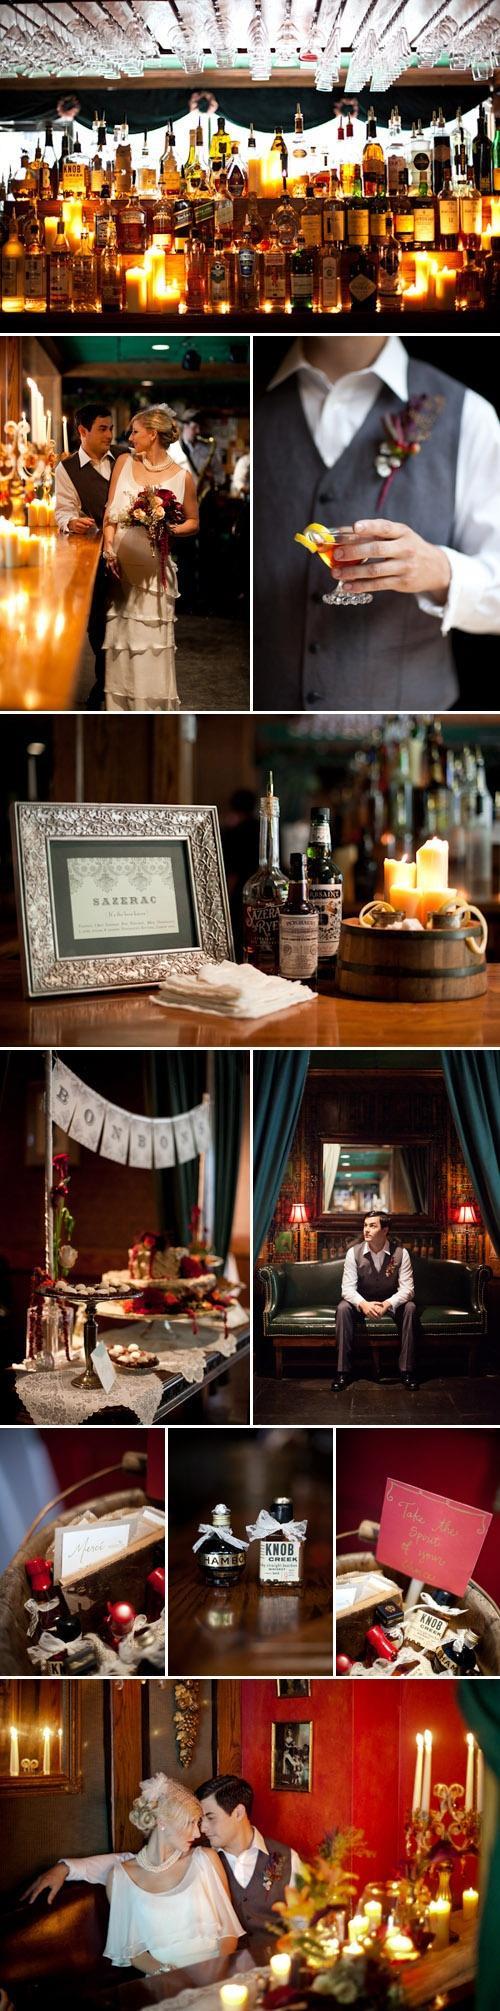 Mariage - Wedding Color Ideas & Inspiration Boards